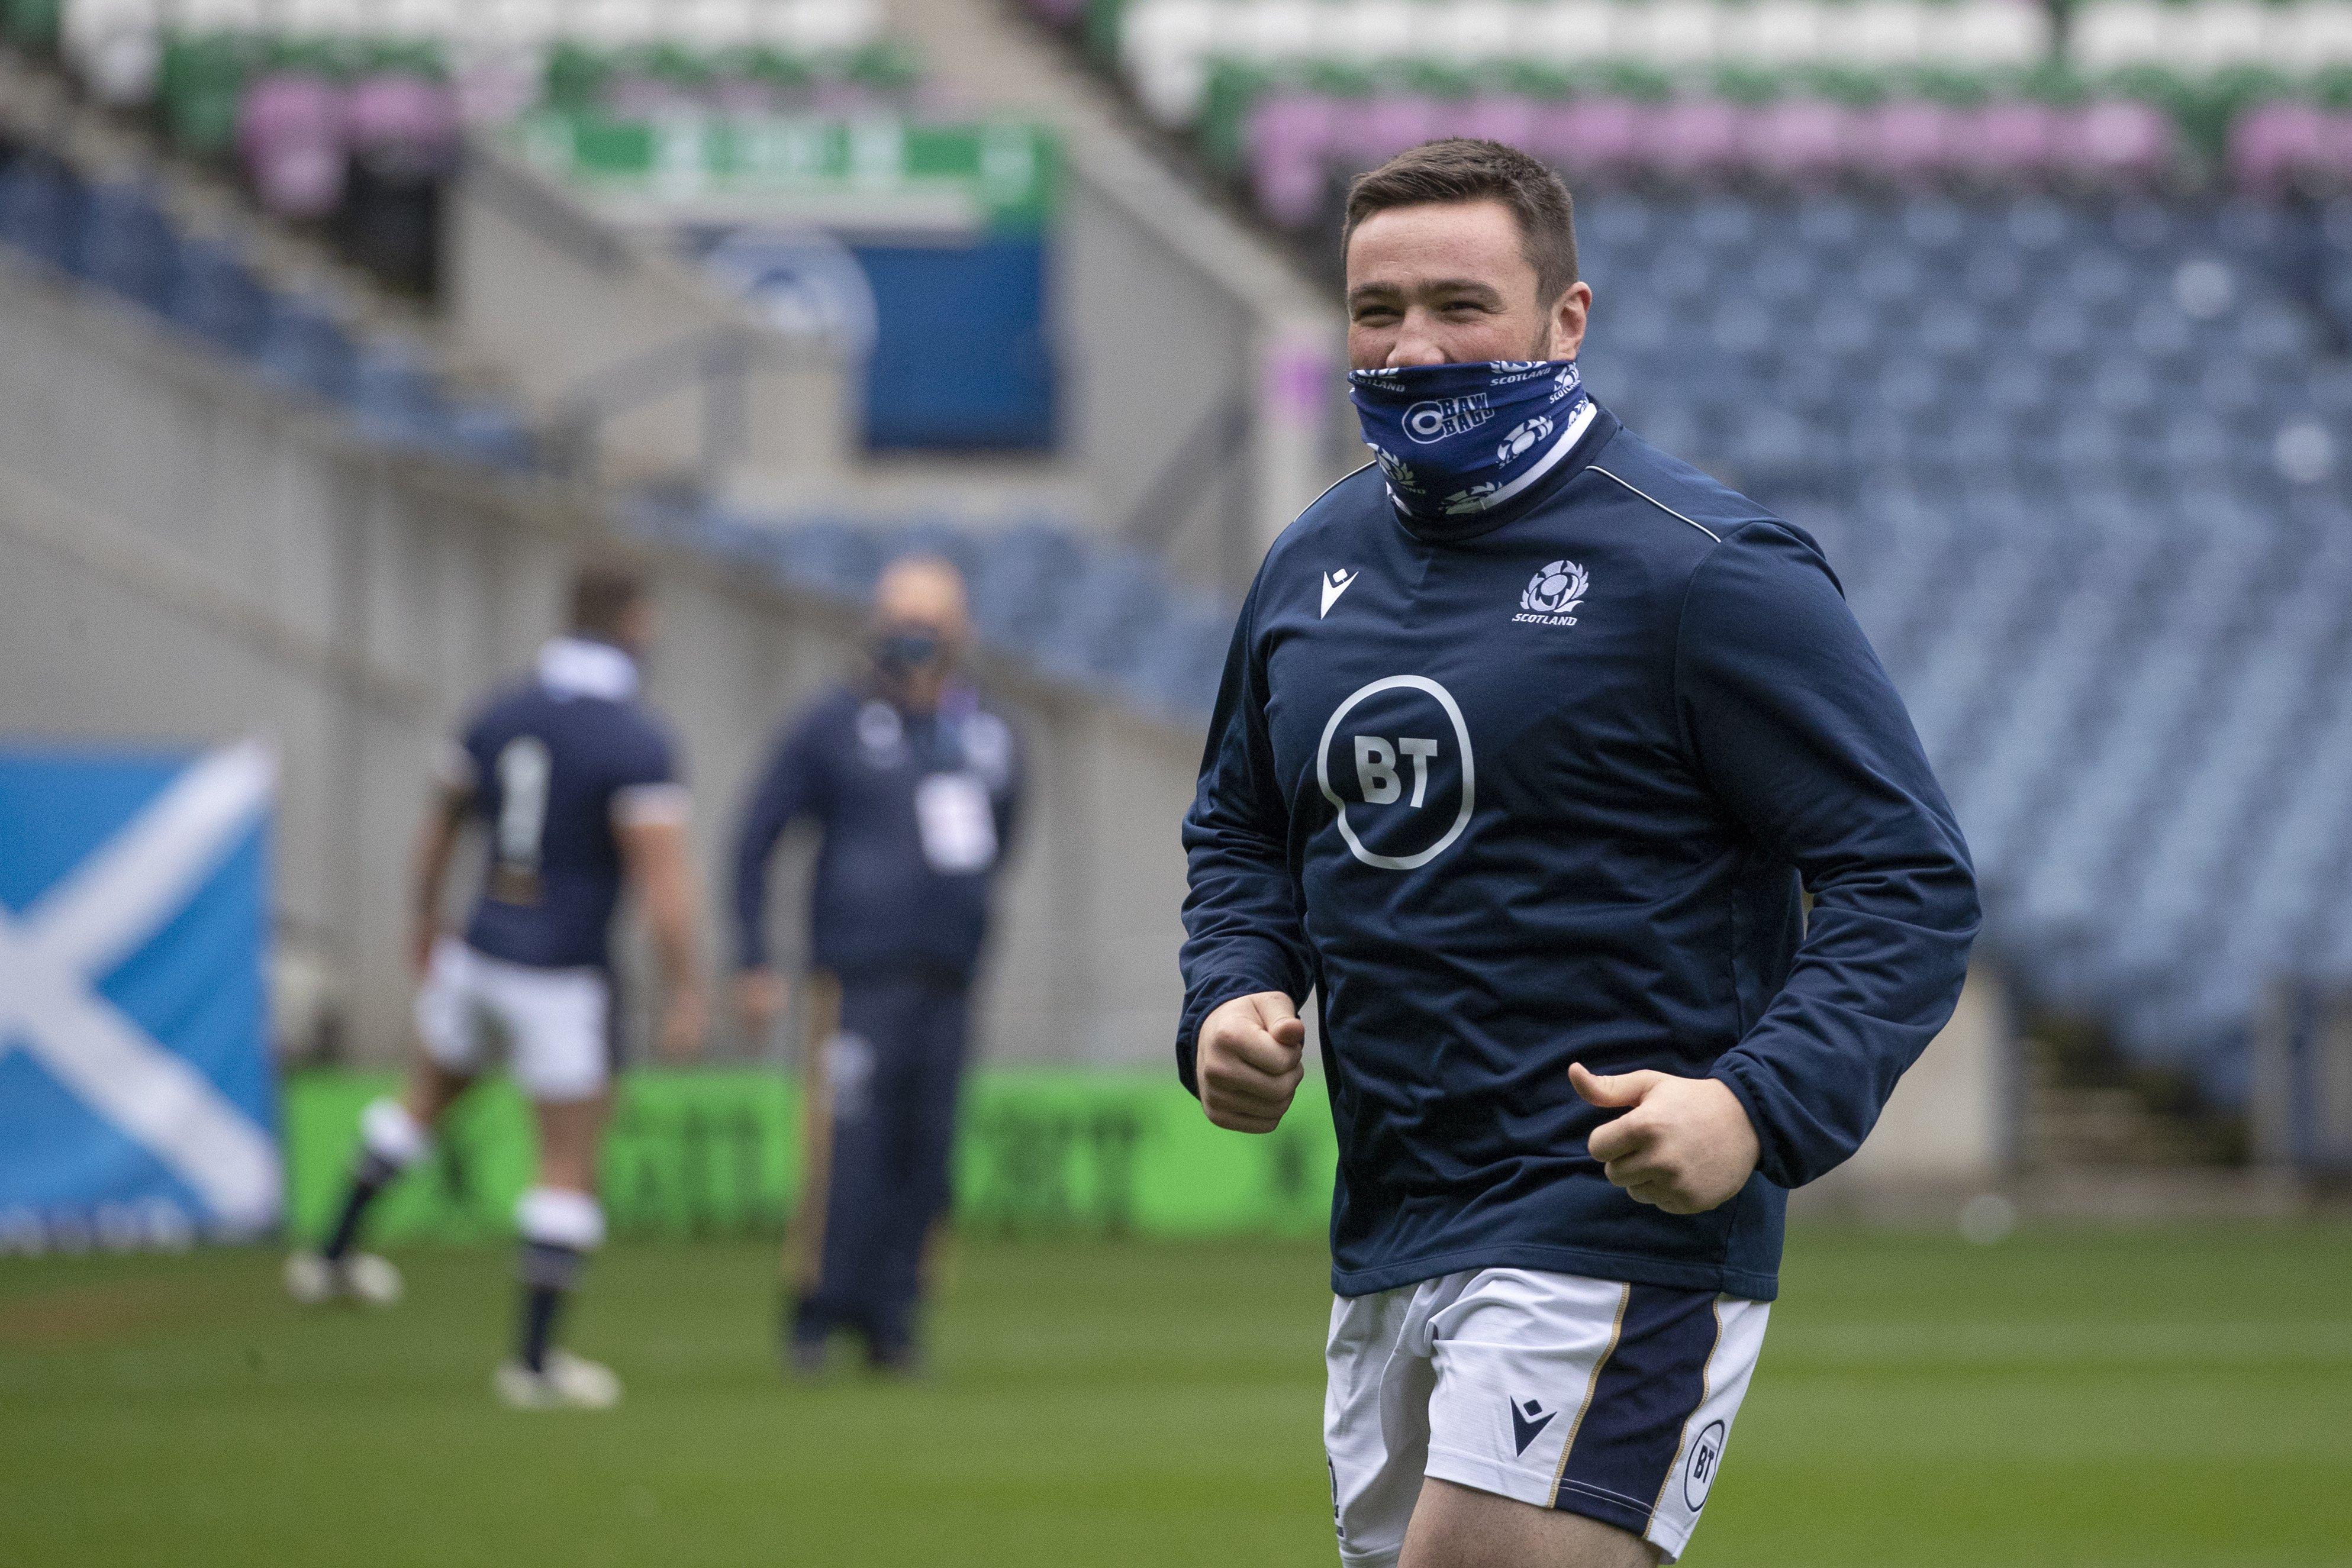 Zander Fagerson: Scotland have 'grown as a team' since last Ireland clash